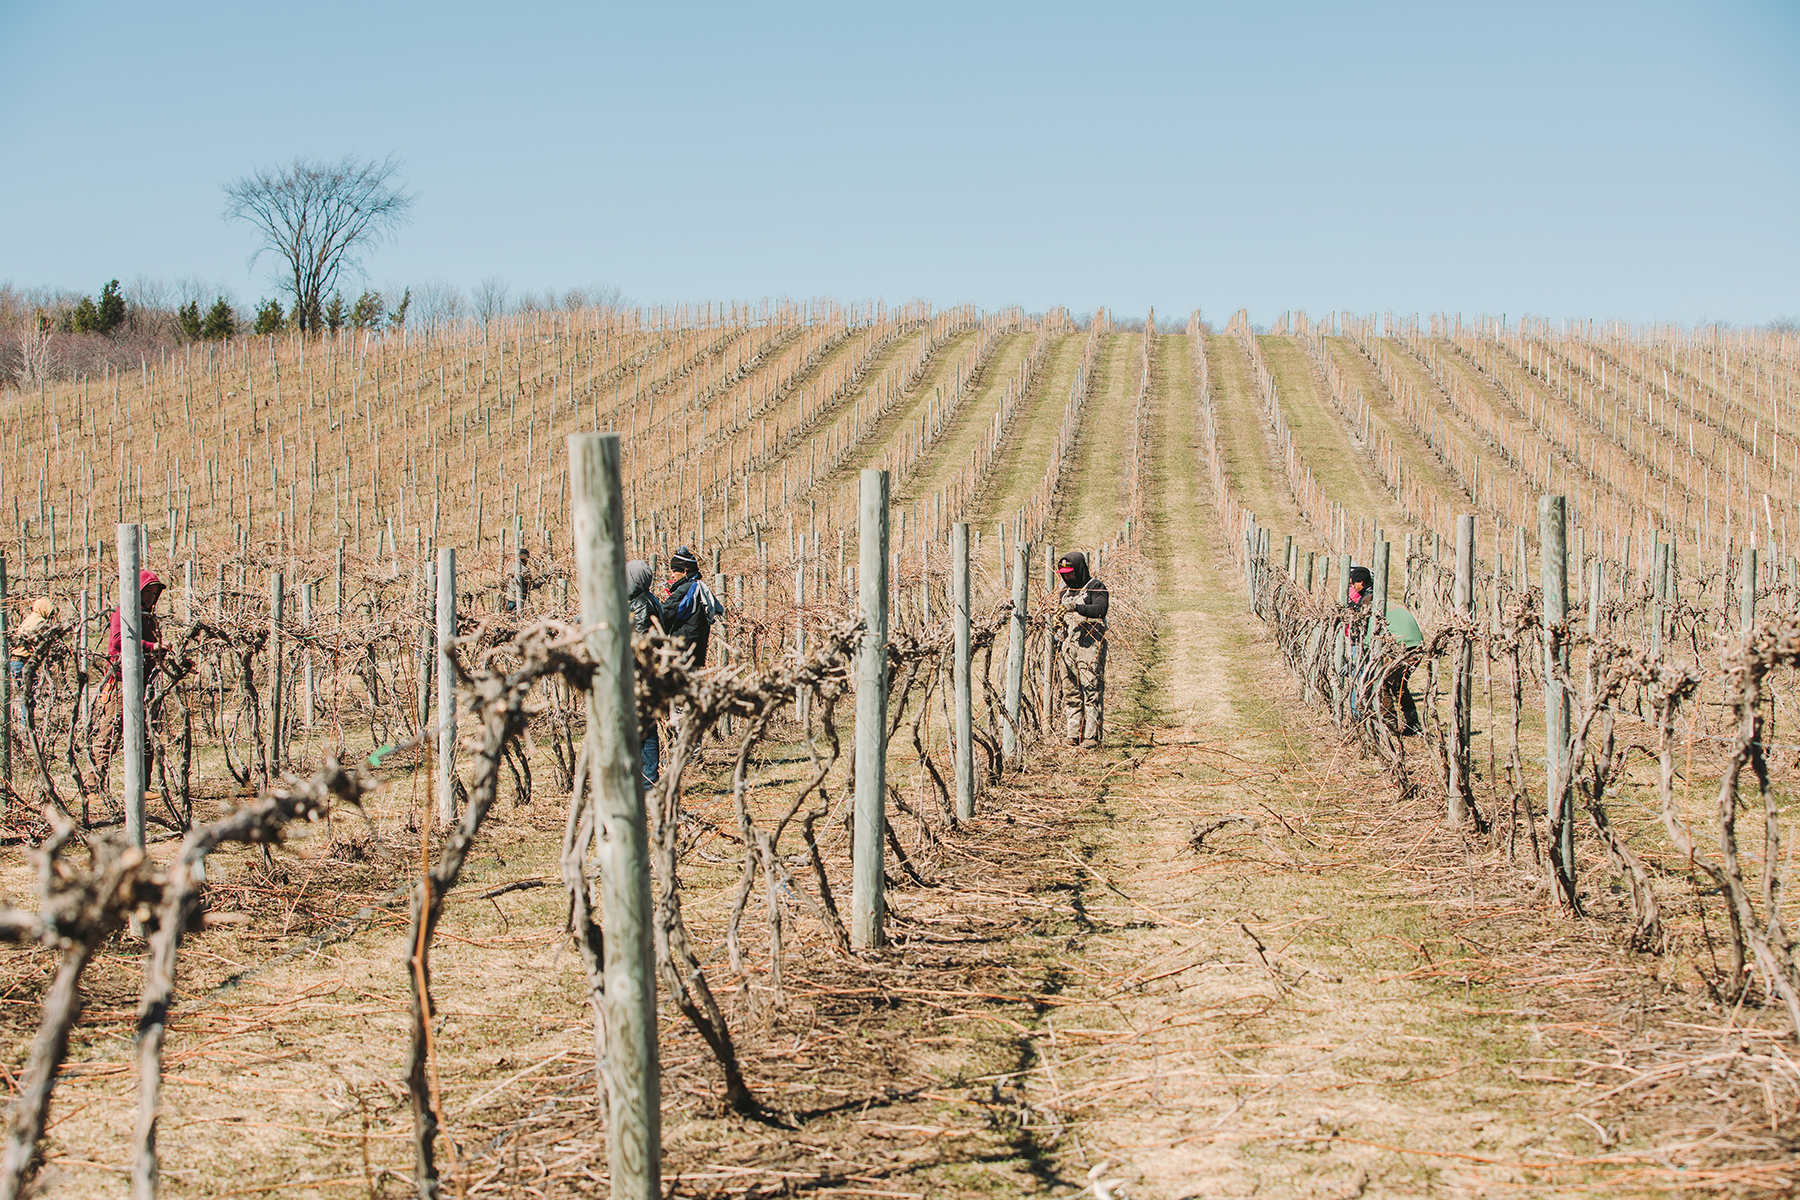 Leelanau County grape vines are pruned in April of 2019.